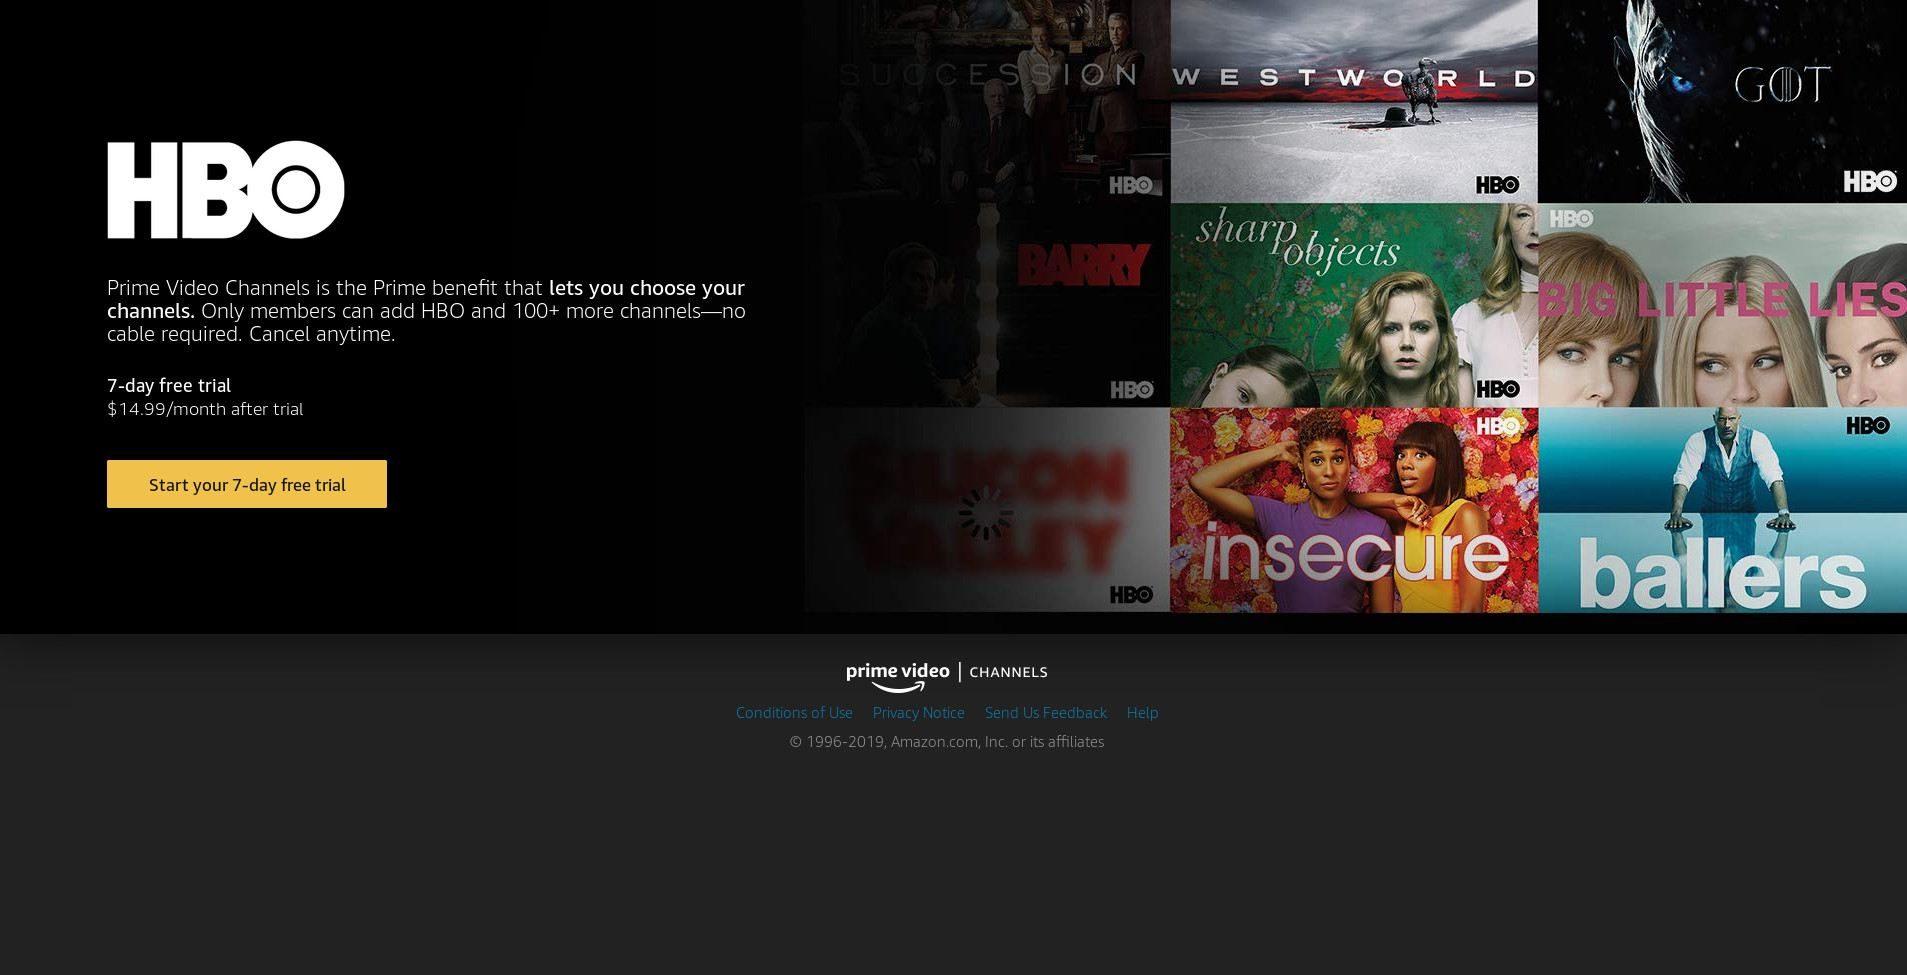 "<span href=""https://9to5mac.com/2020/05/09/amazon-prime-video-channels-vs-apple-tv-channels/"">Apple TV con Canales vs Amazon Prime Canales de Vídeo: ¿Cómo se debe gestionar los servicios de streaming?</a>"